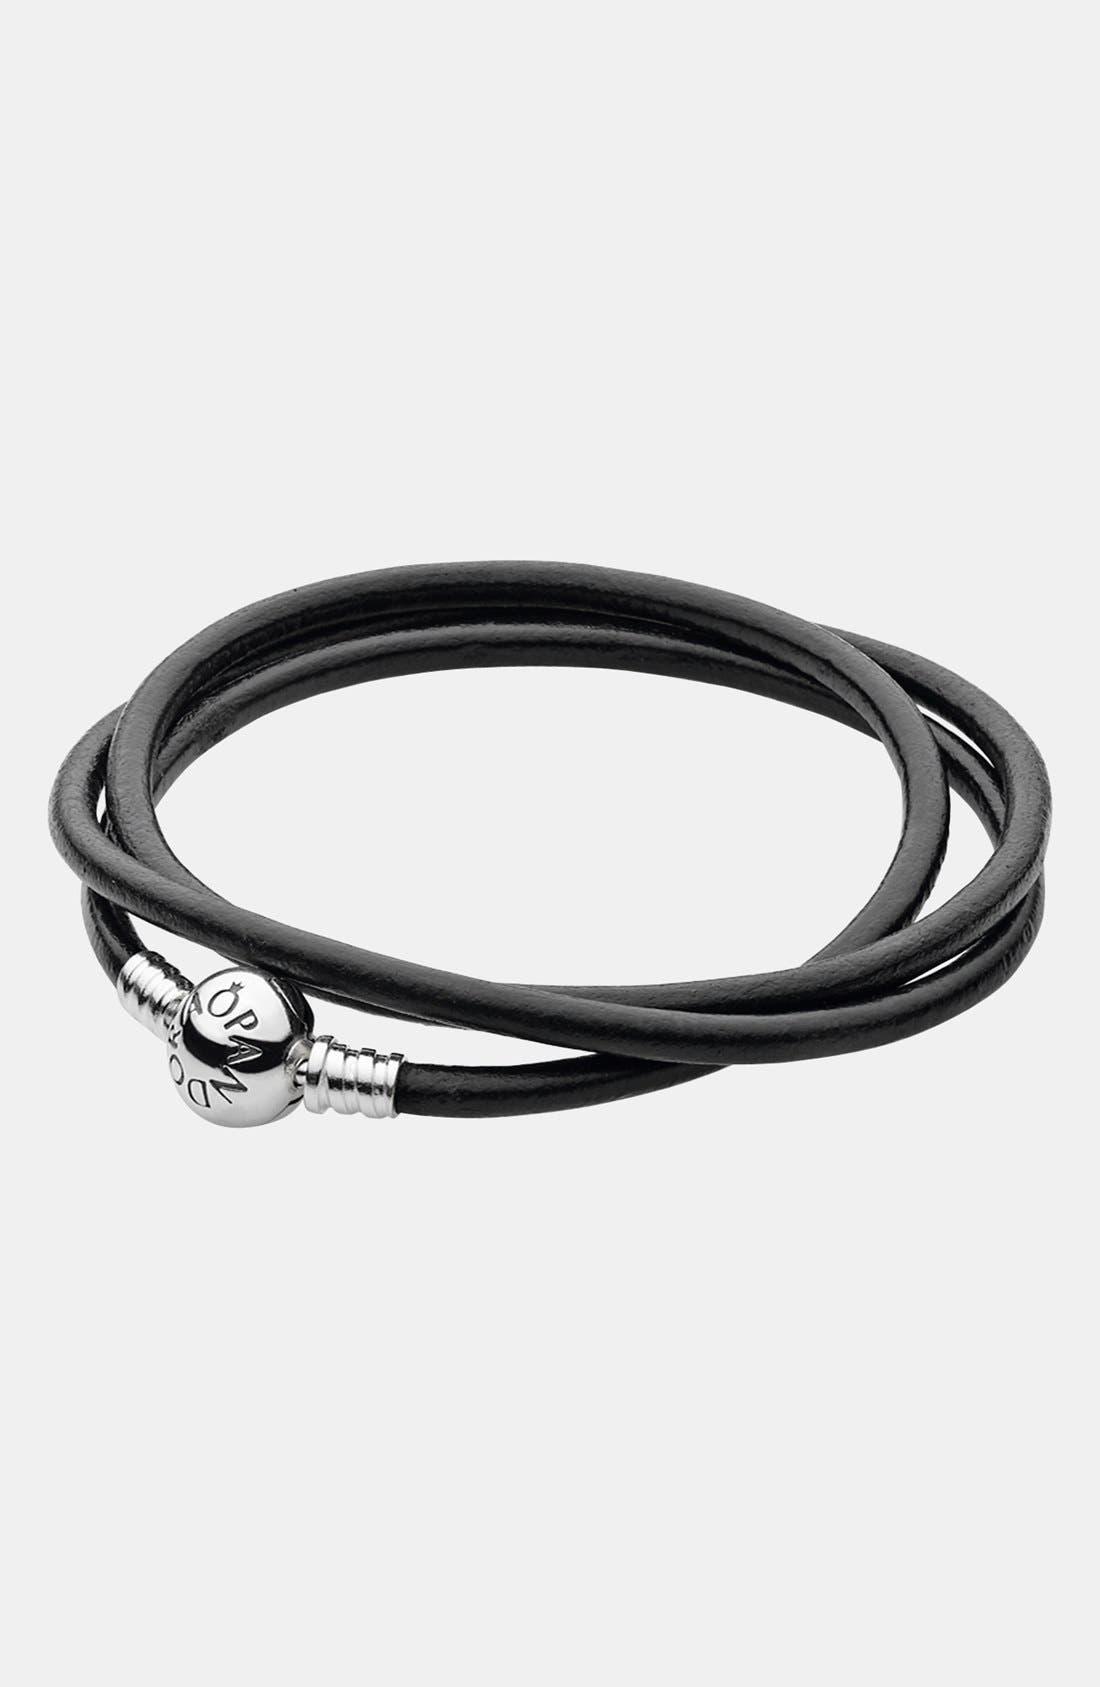 Main Image - PANDORA Leather Wrap Charm Bracelet